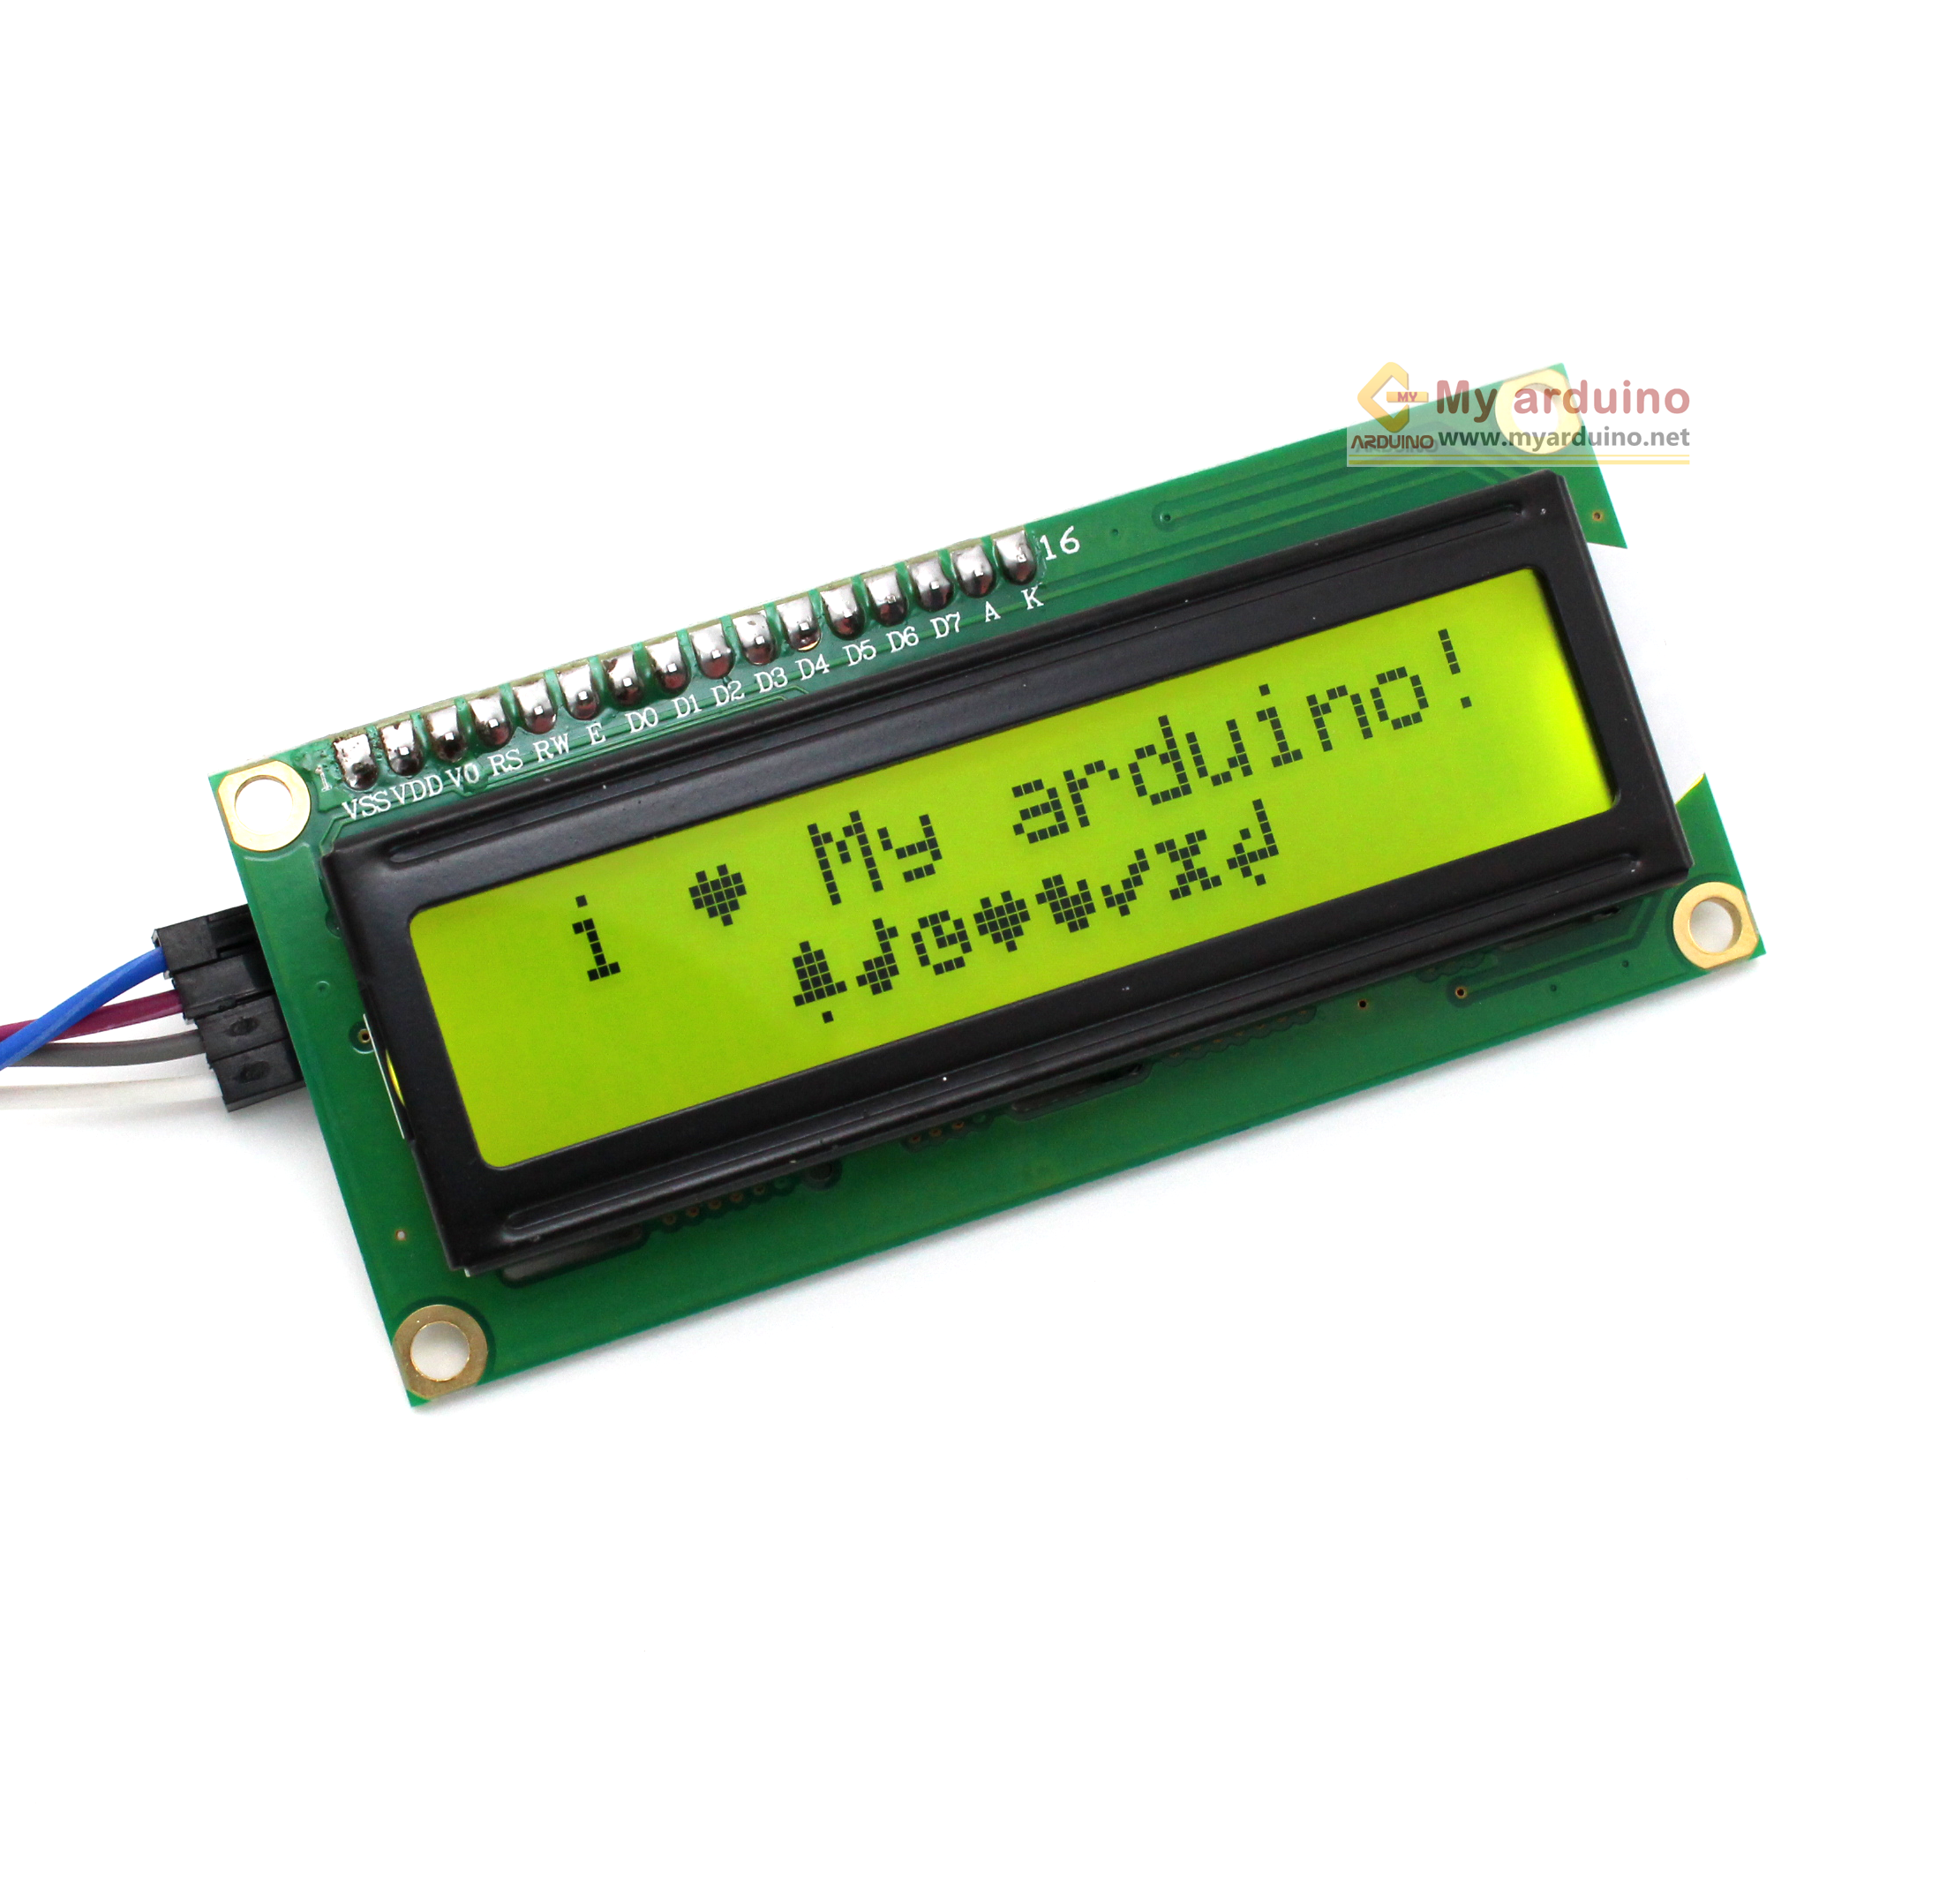 1602 LCD (Yellow Screen) 16x2 โมดูลจอ LCD พร้อม I2C Interface